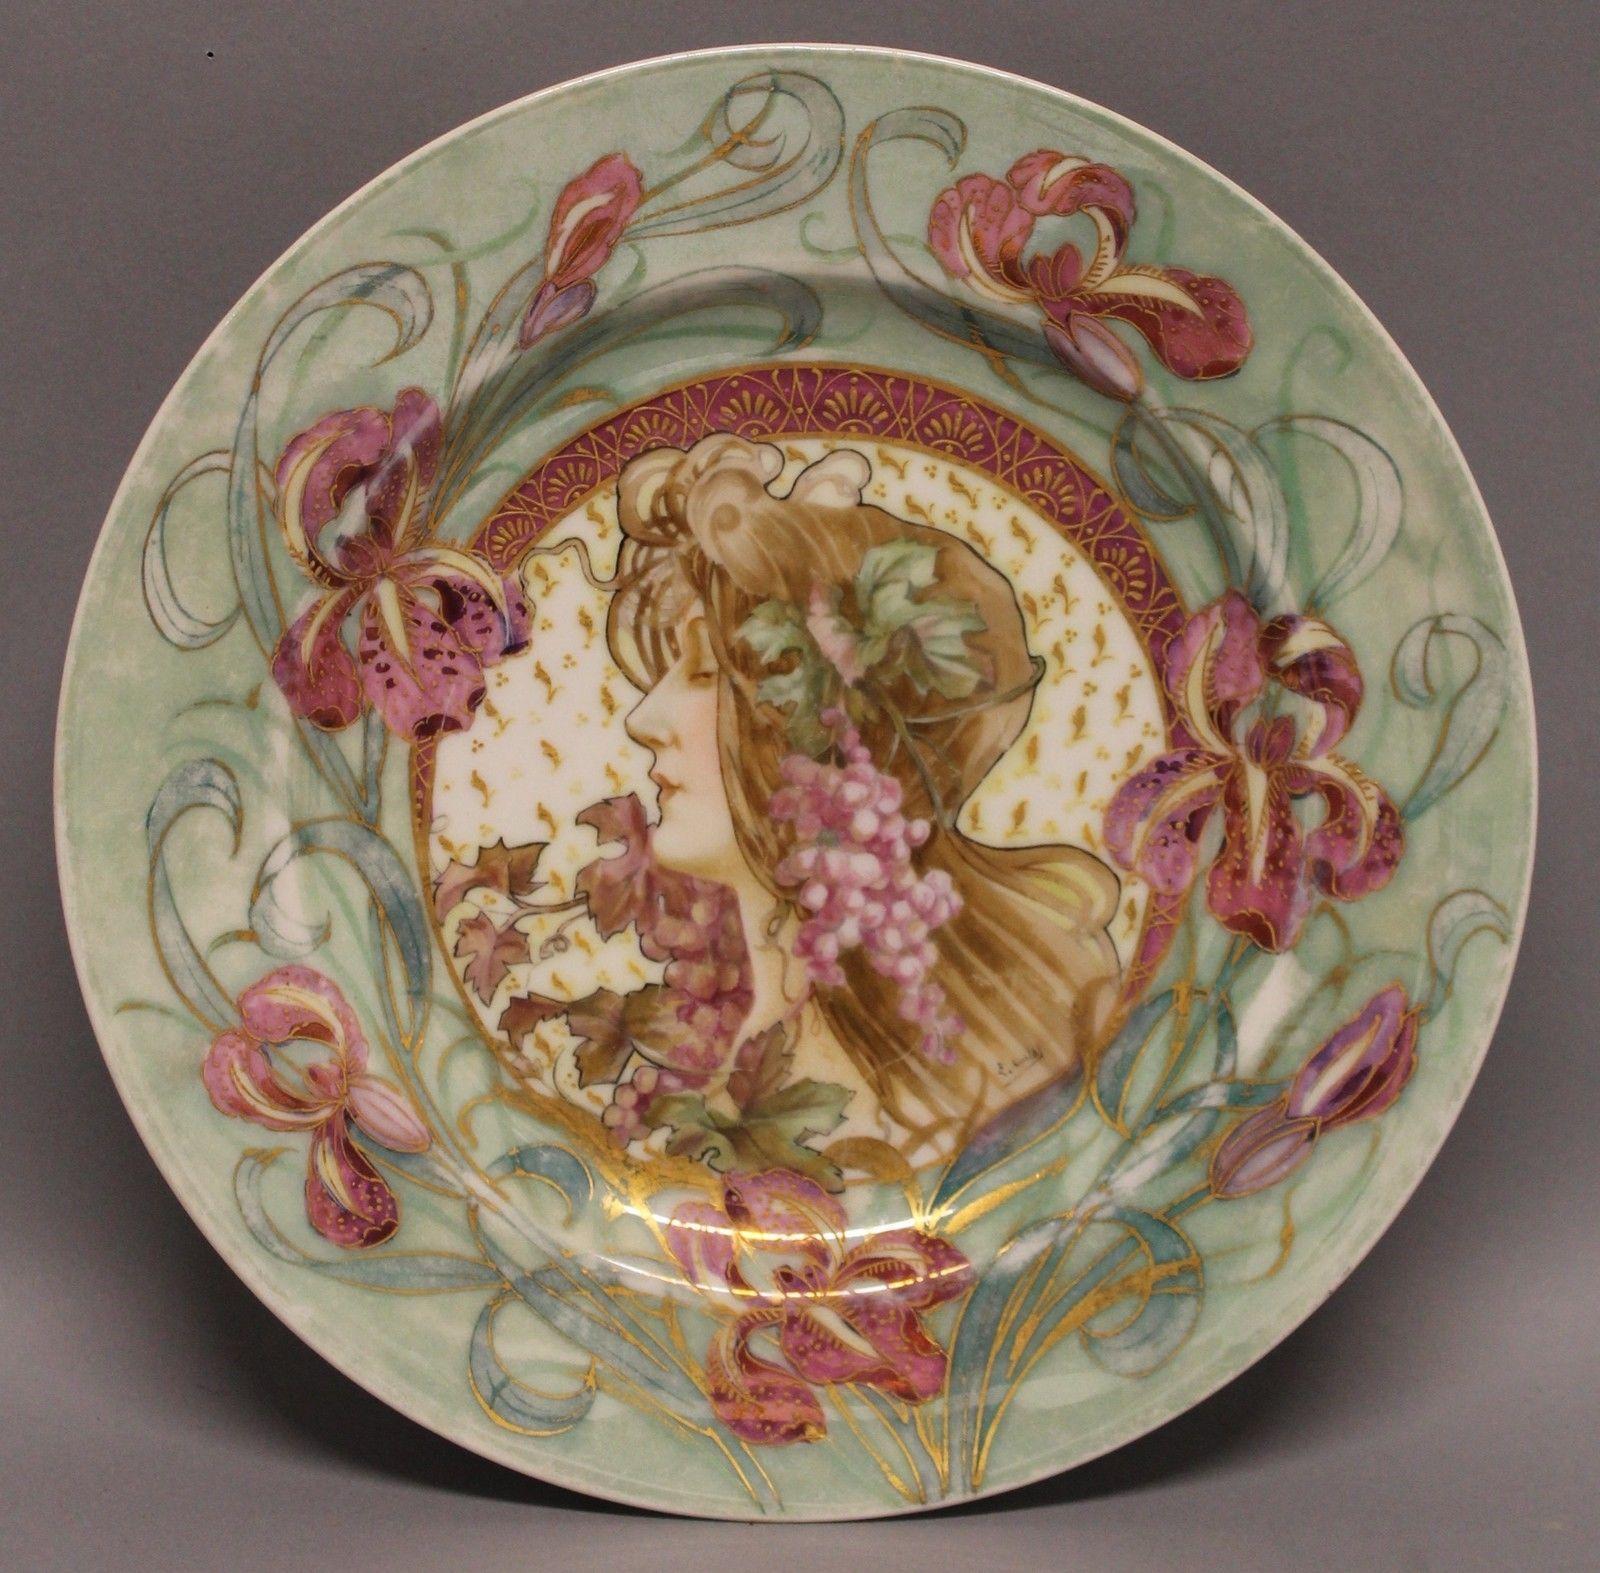 Antique Signed Sevres French Art Nouveau Woman Porcelain Hand Painted Plate   eBay